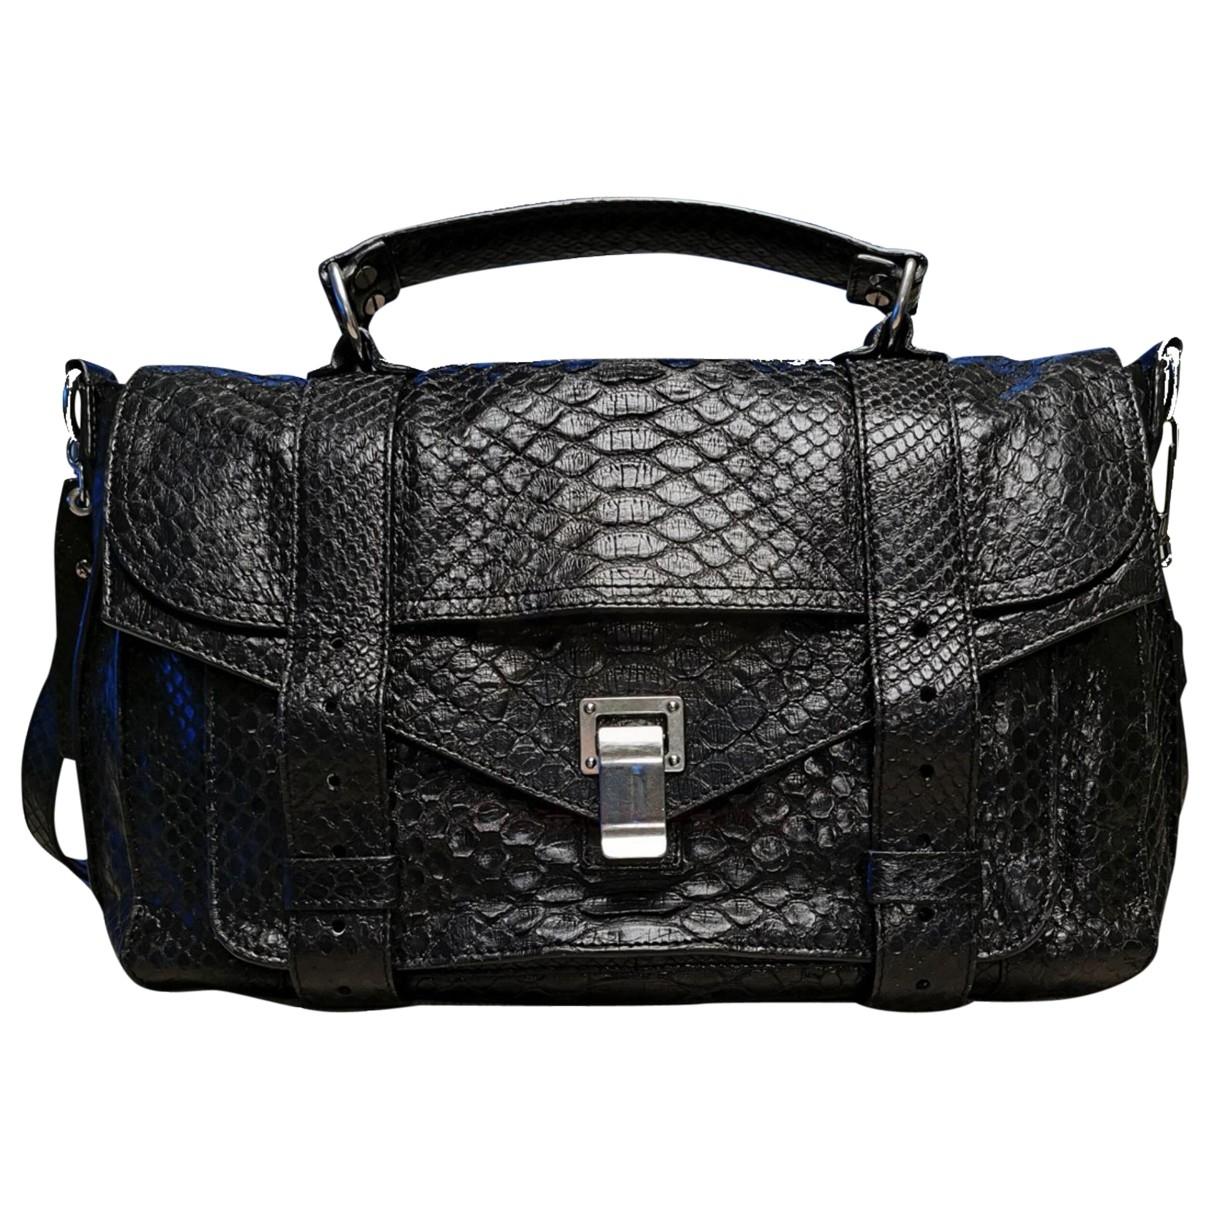 Proenza Schouler PS1 Handtasche in  Schwarz Python